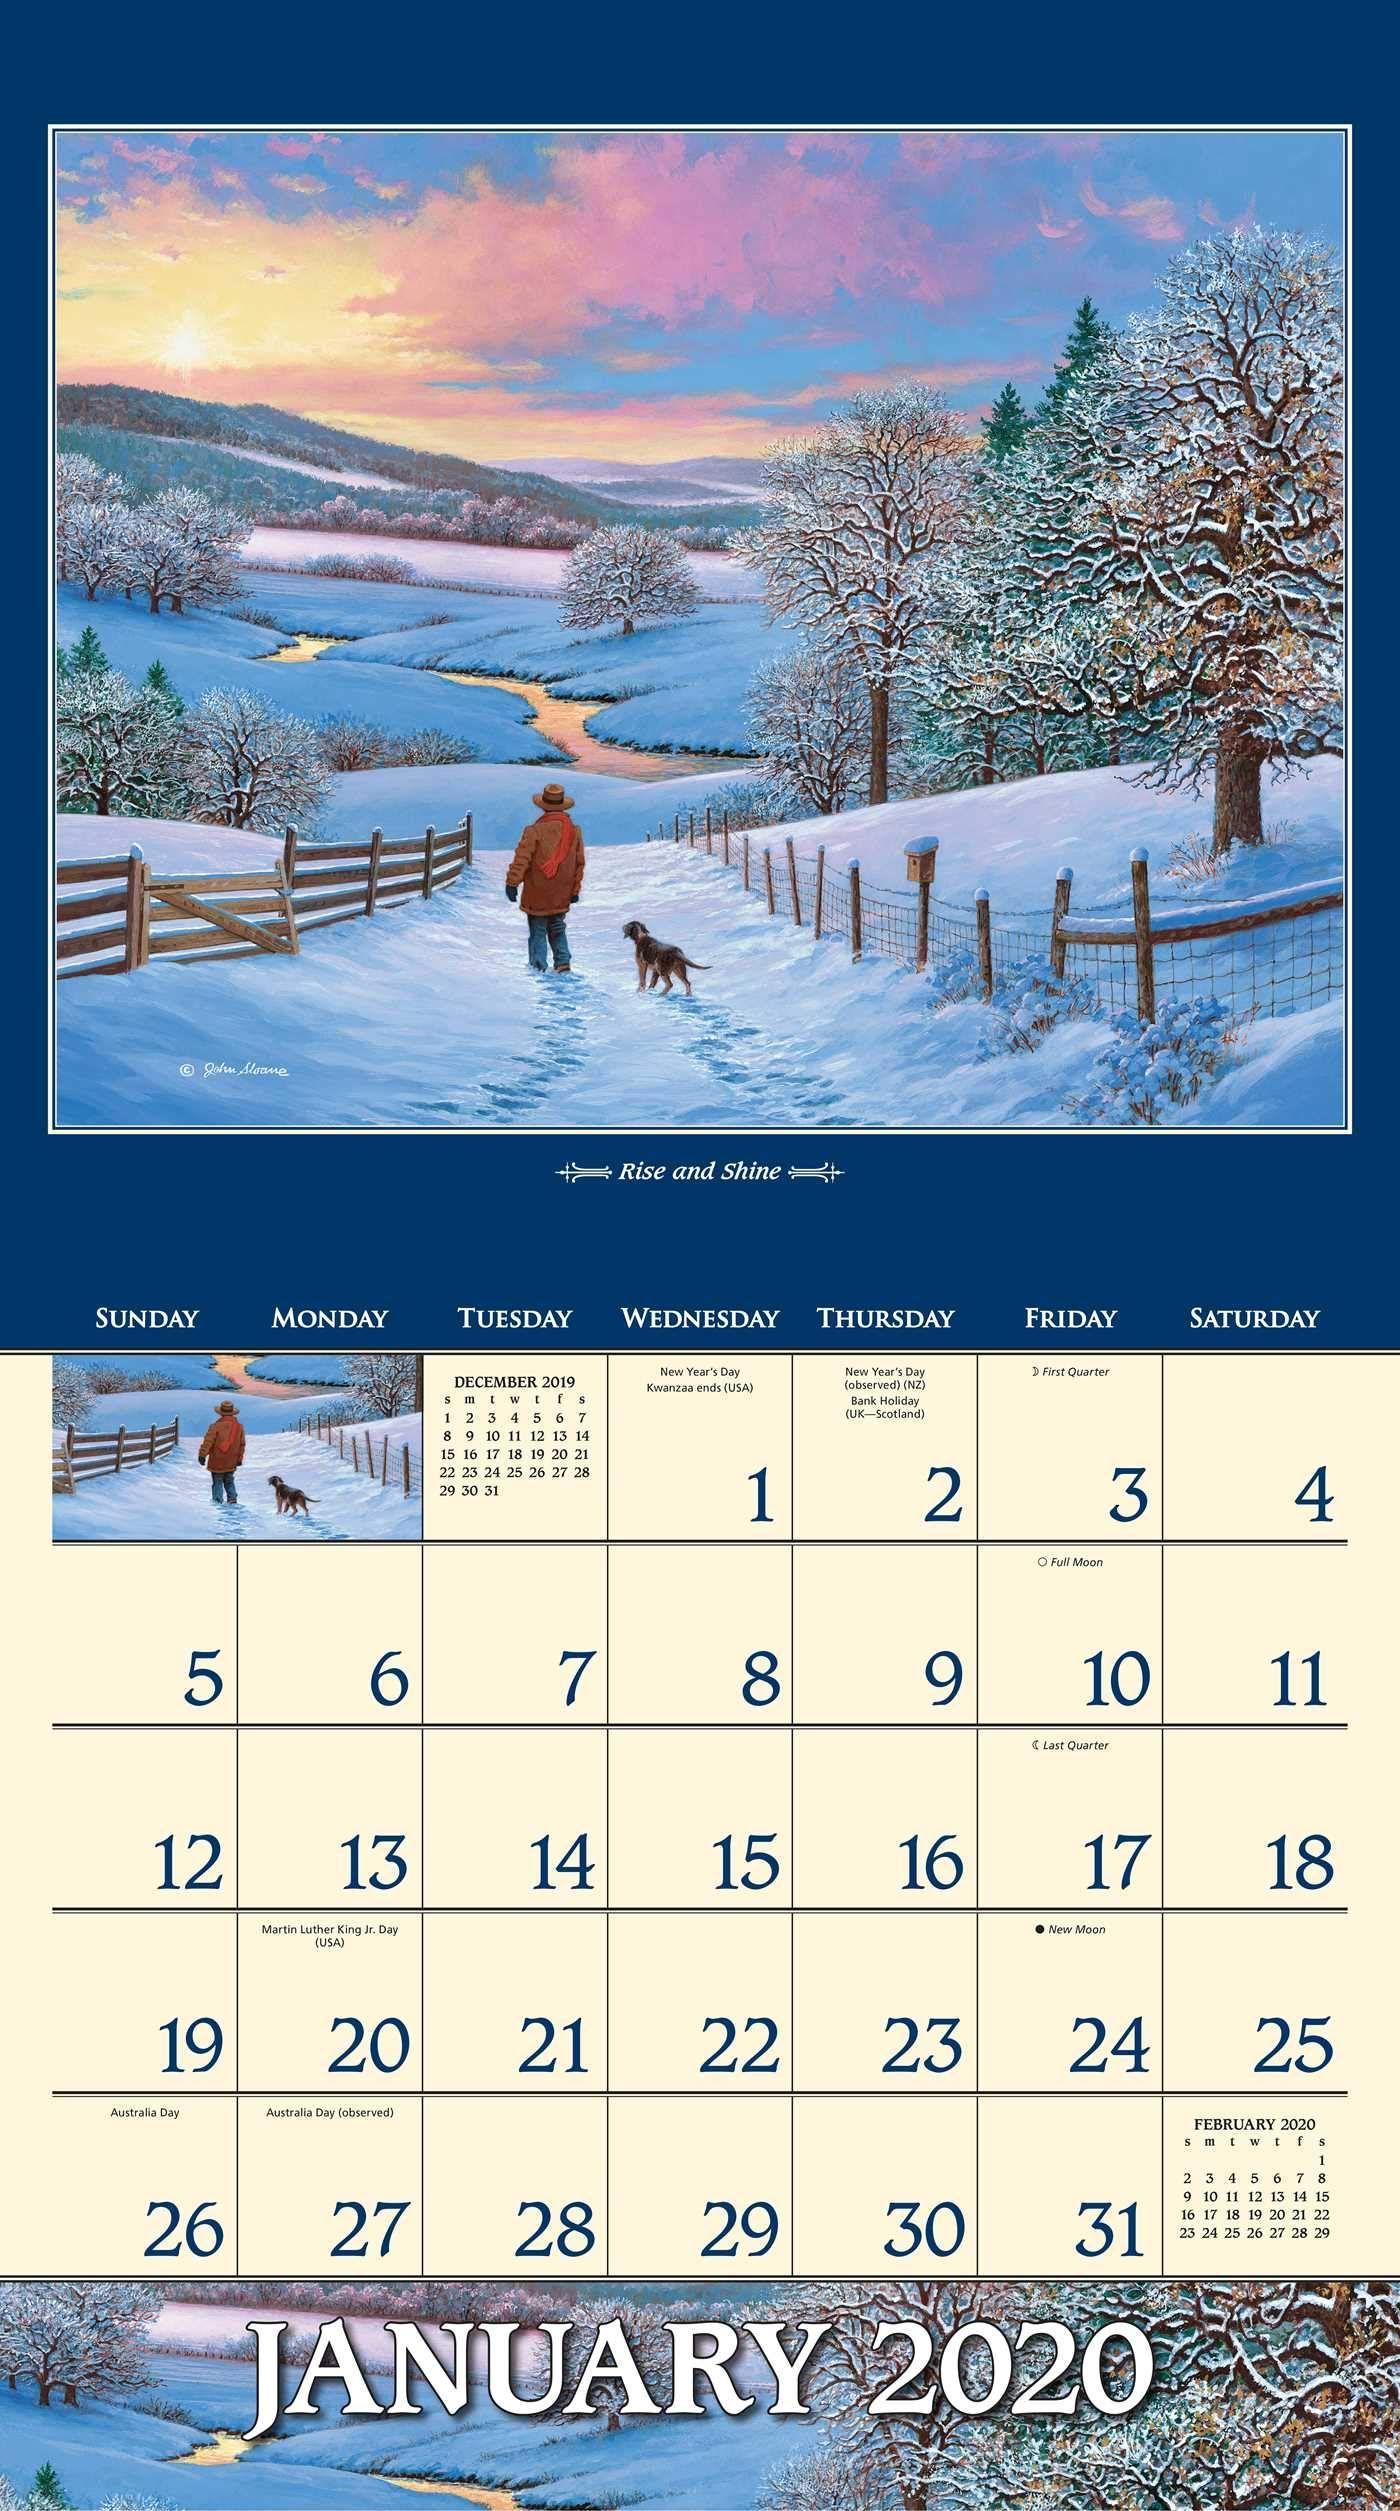 February 2020 Fashion Calendar John Sloane's Country Seasons 2020 Deluxe Wall Calendar Calendar